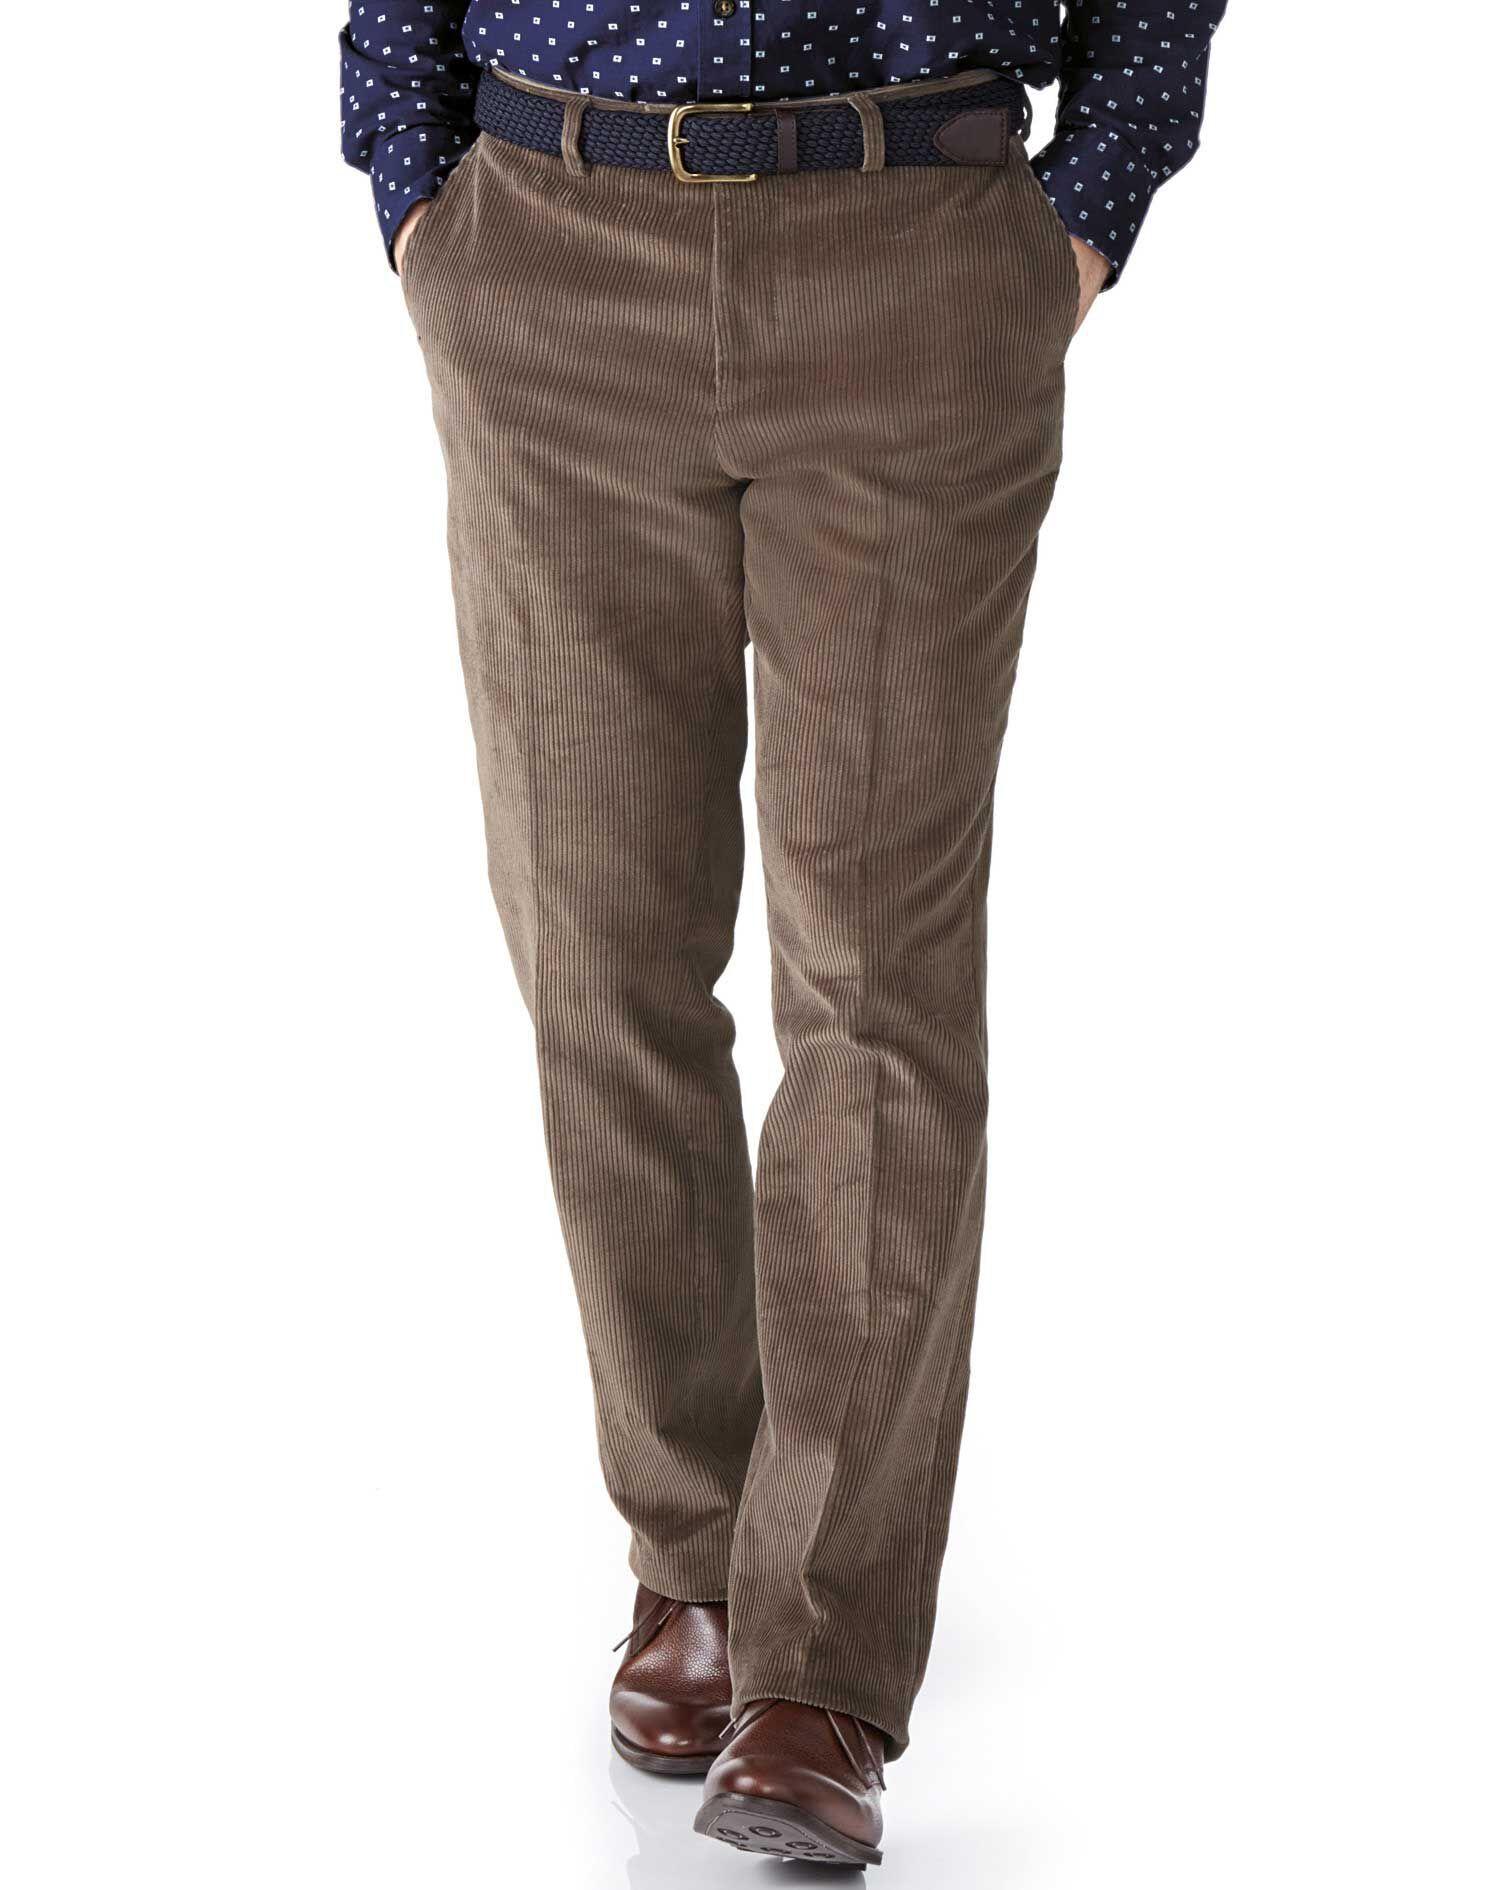 Beige Slim Fit Jumbo Cord Trouser Size W42 L34 by Charles Tyrwhitt